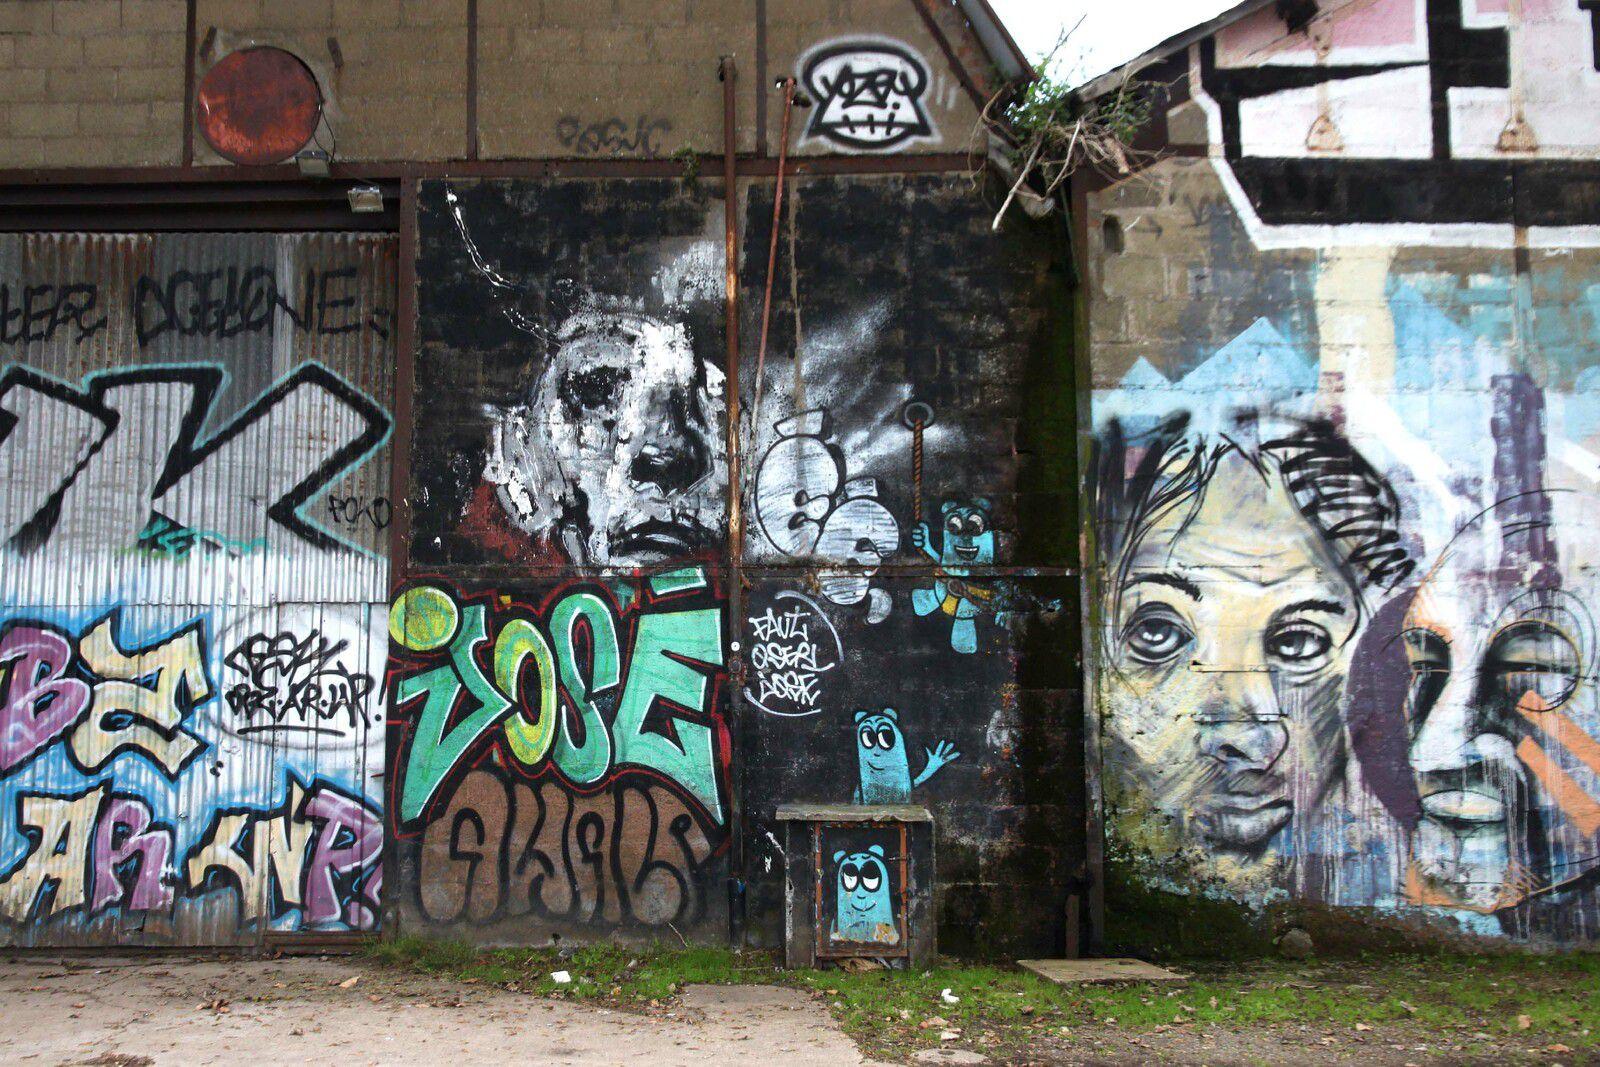 Street Art et Graffiti à Redon - Mercredi 14 juillet 2021